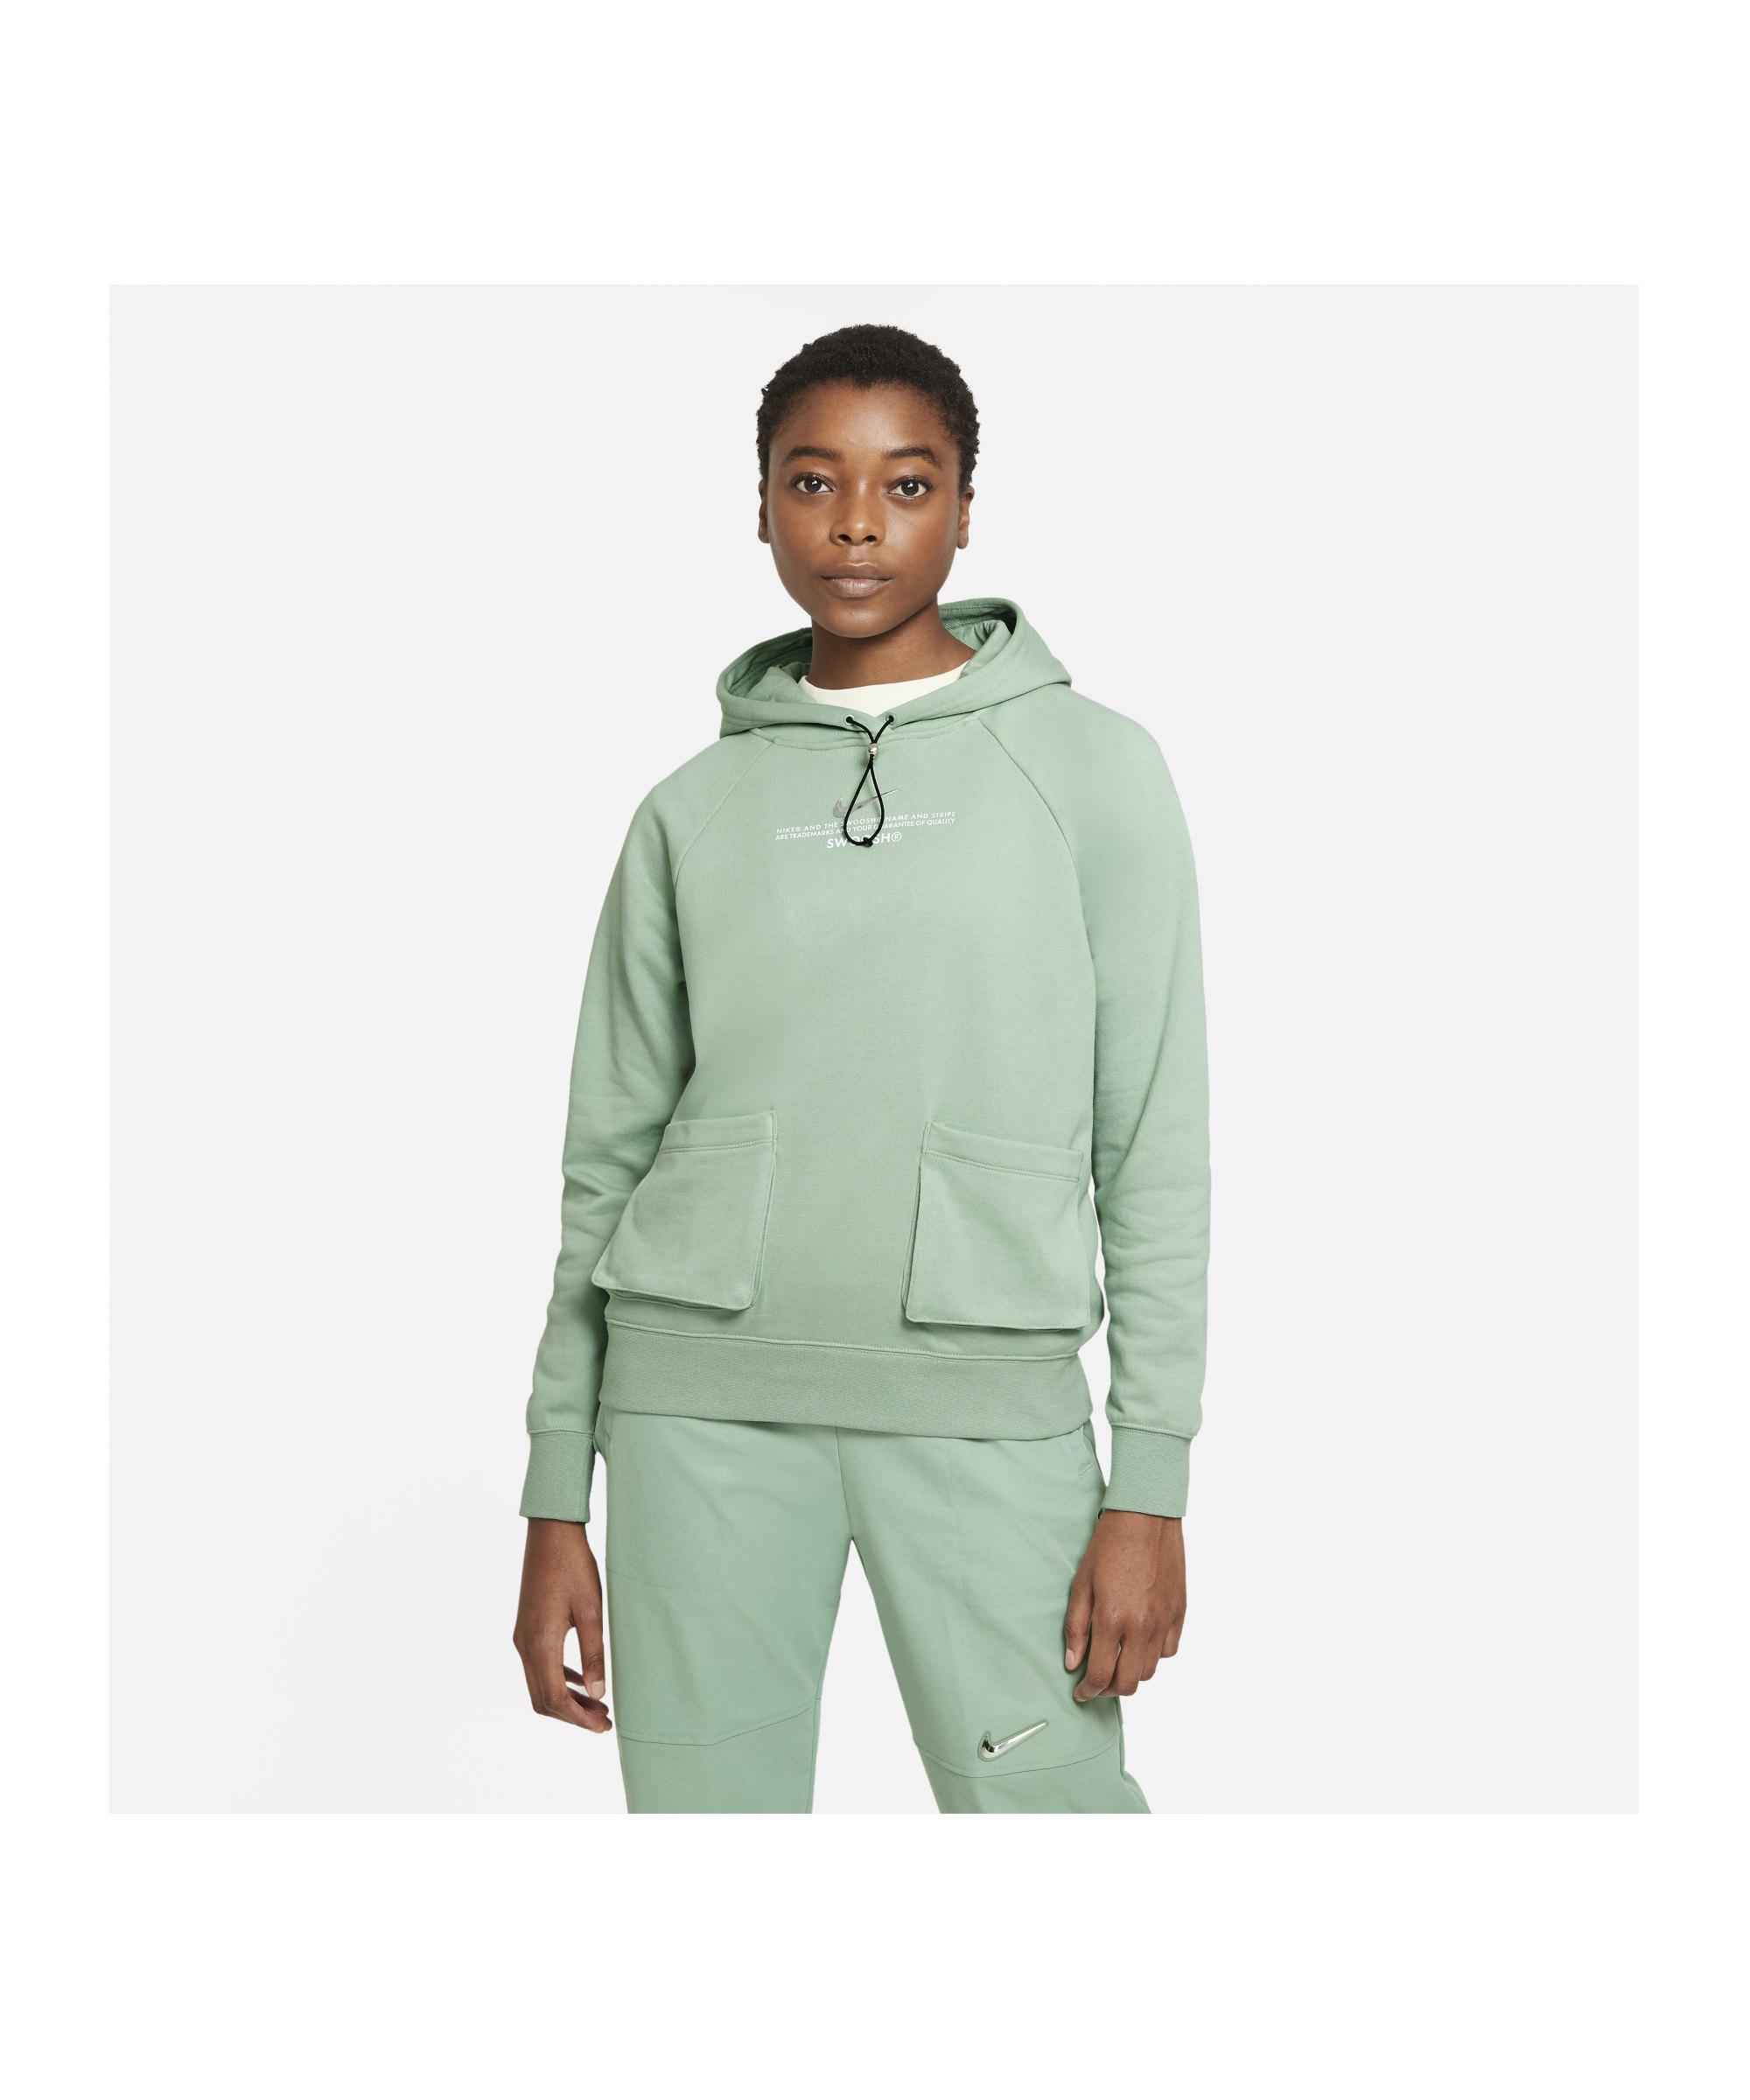 Nike Swoosh Fleece Hoody Damen Grün Weiss F006 - gruen